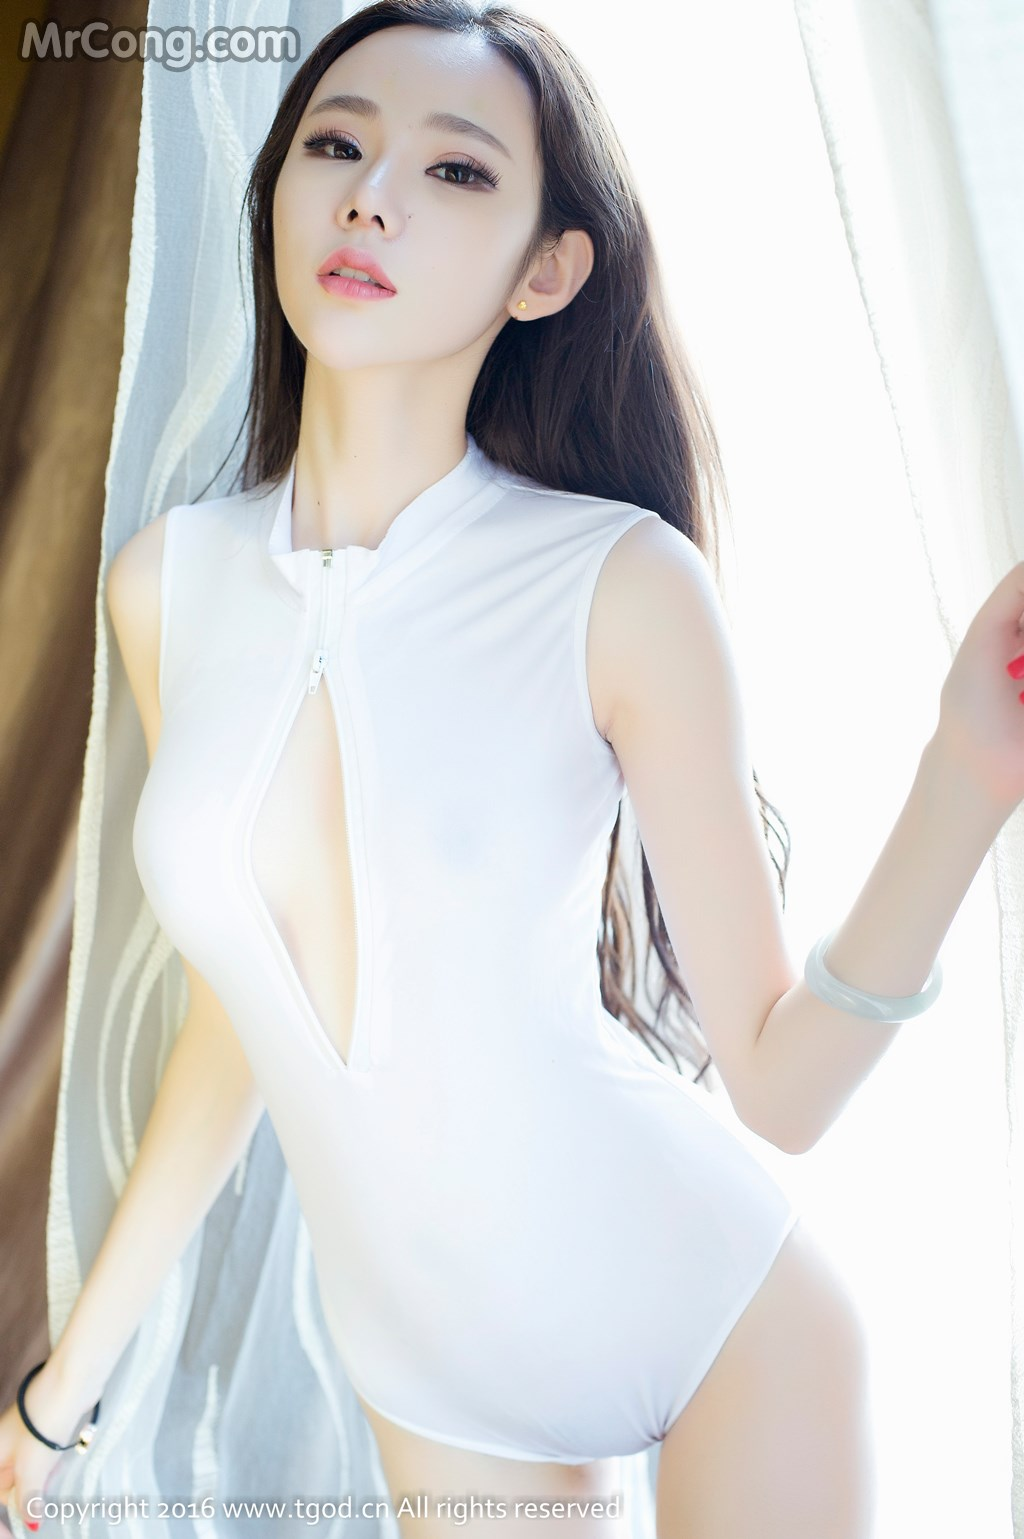 TGOD 2016-10-14: Người mẫu Irene (萌琪琪) (60 ảnh)